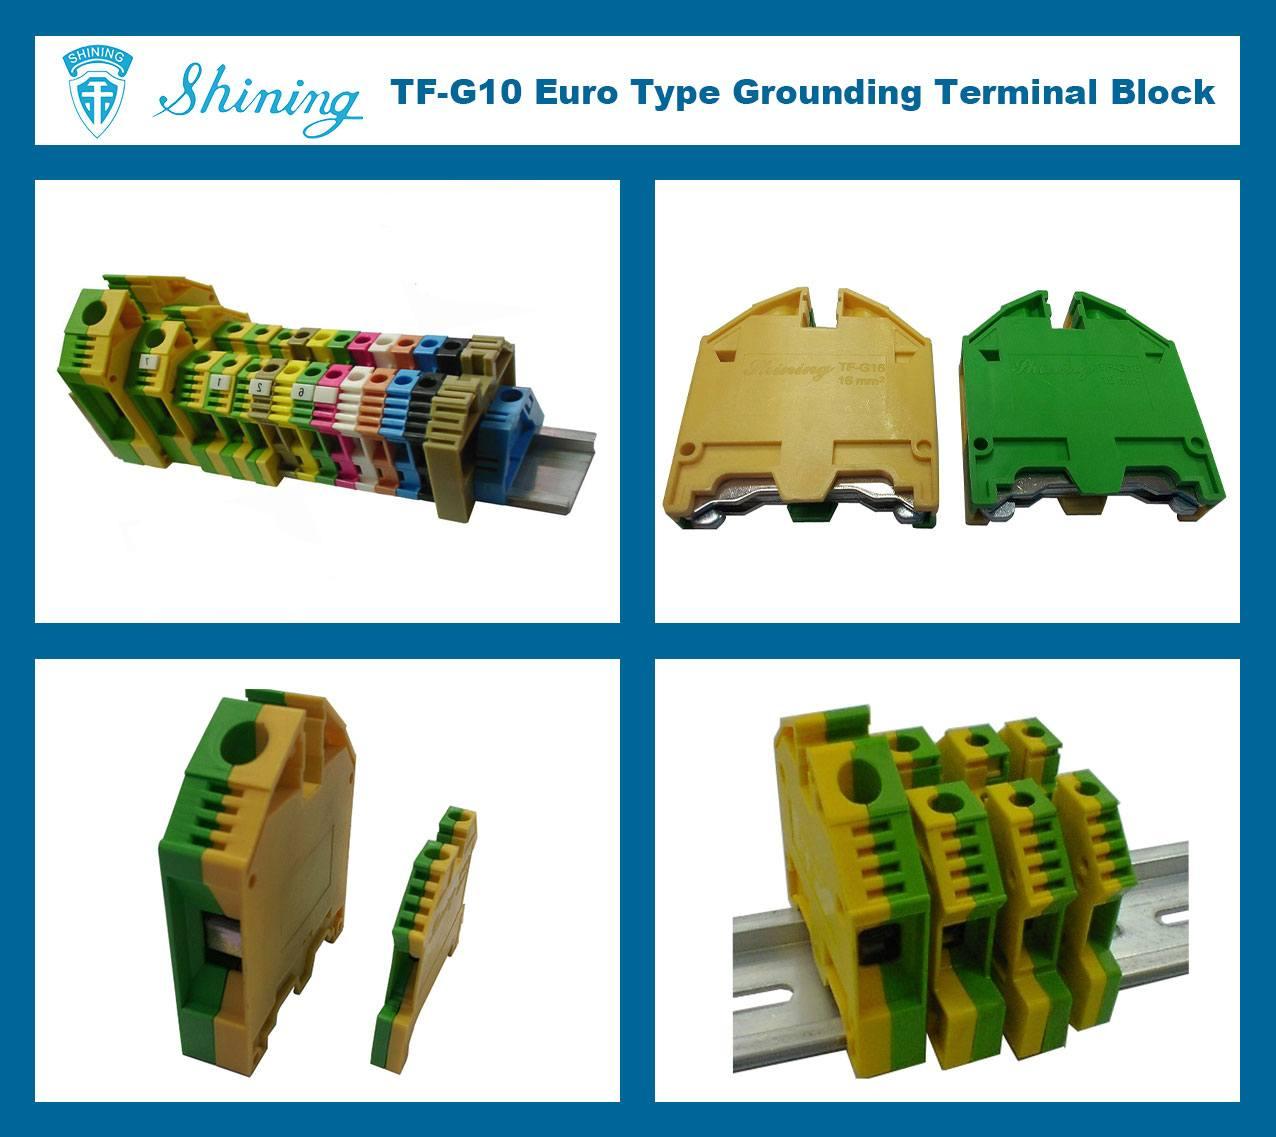 TF-G10 Euro Type 10mm Ground Earthing Terminal Strip